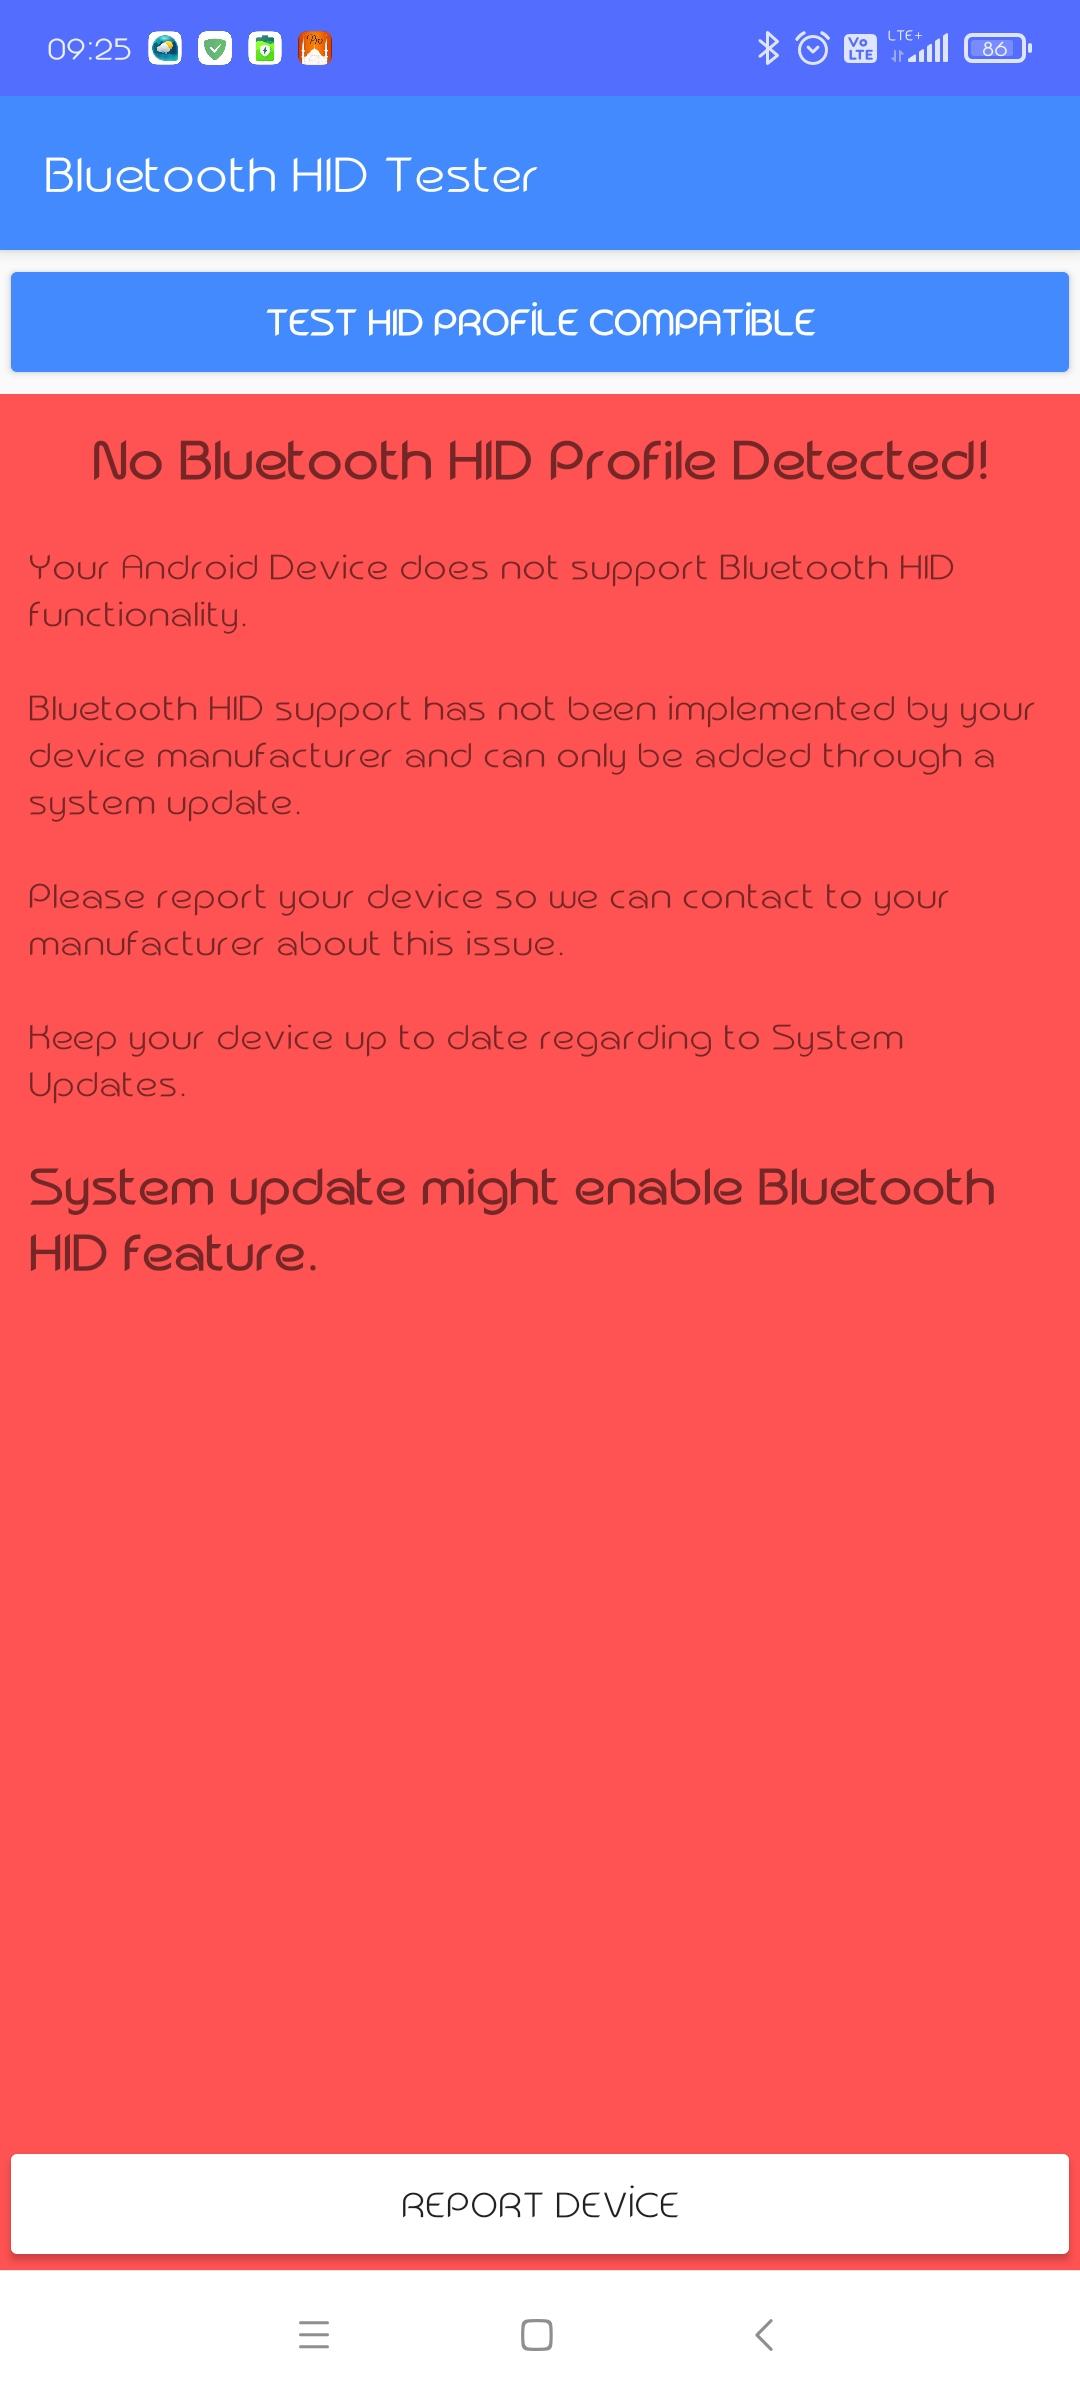 Screenshot_2021-03-09-09-25-25-163_com.rdapps.bluetoothhidtester.jpg